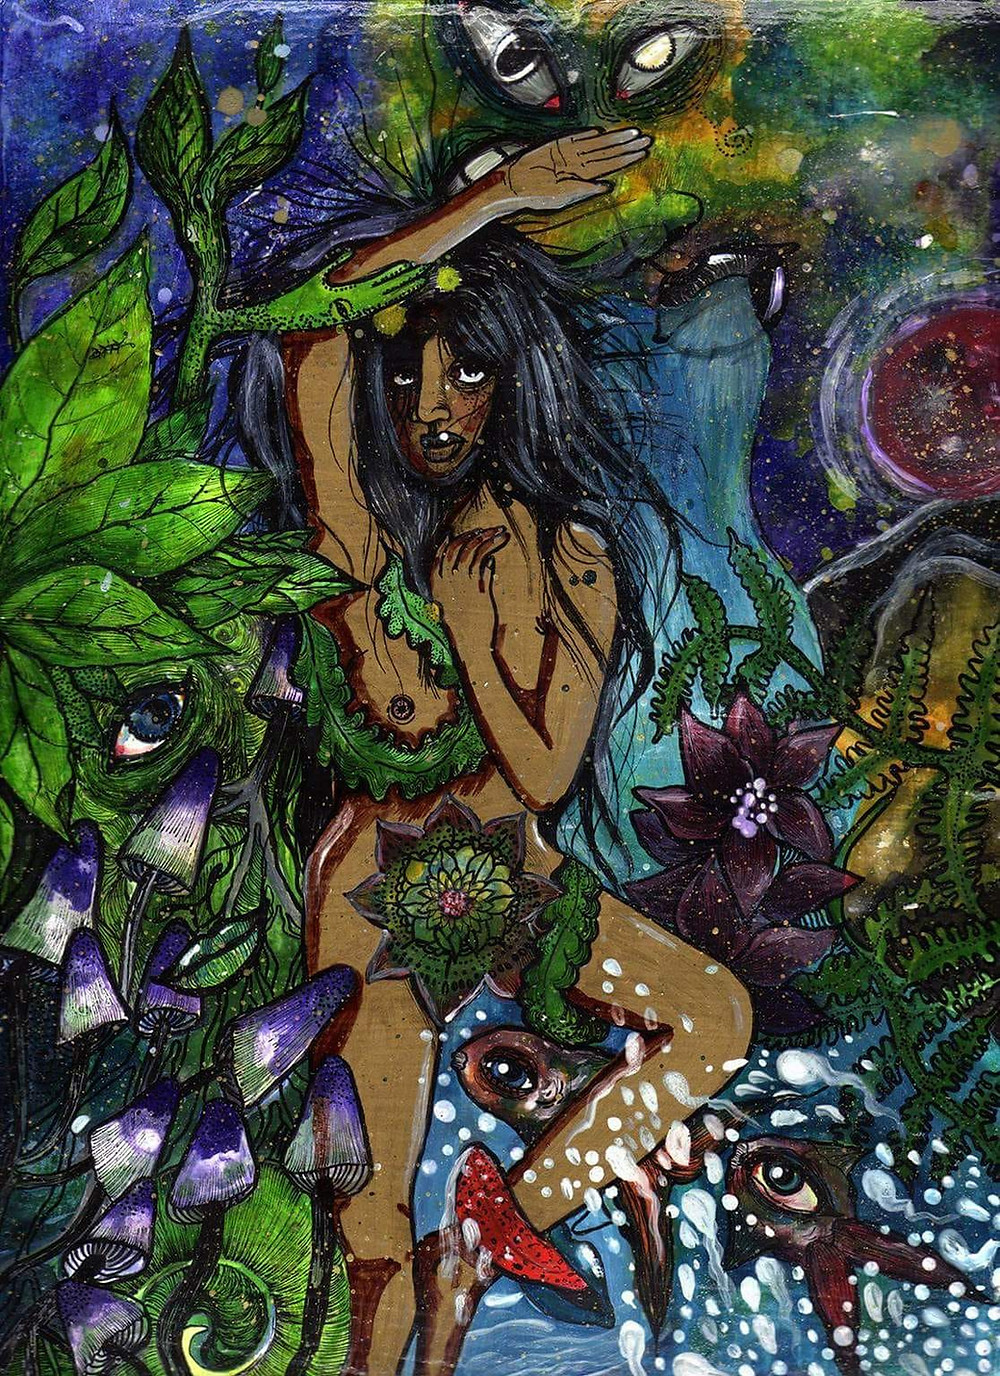 http://organicorgasmic.tumblr.com/